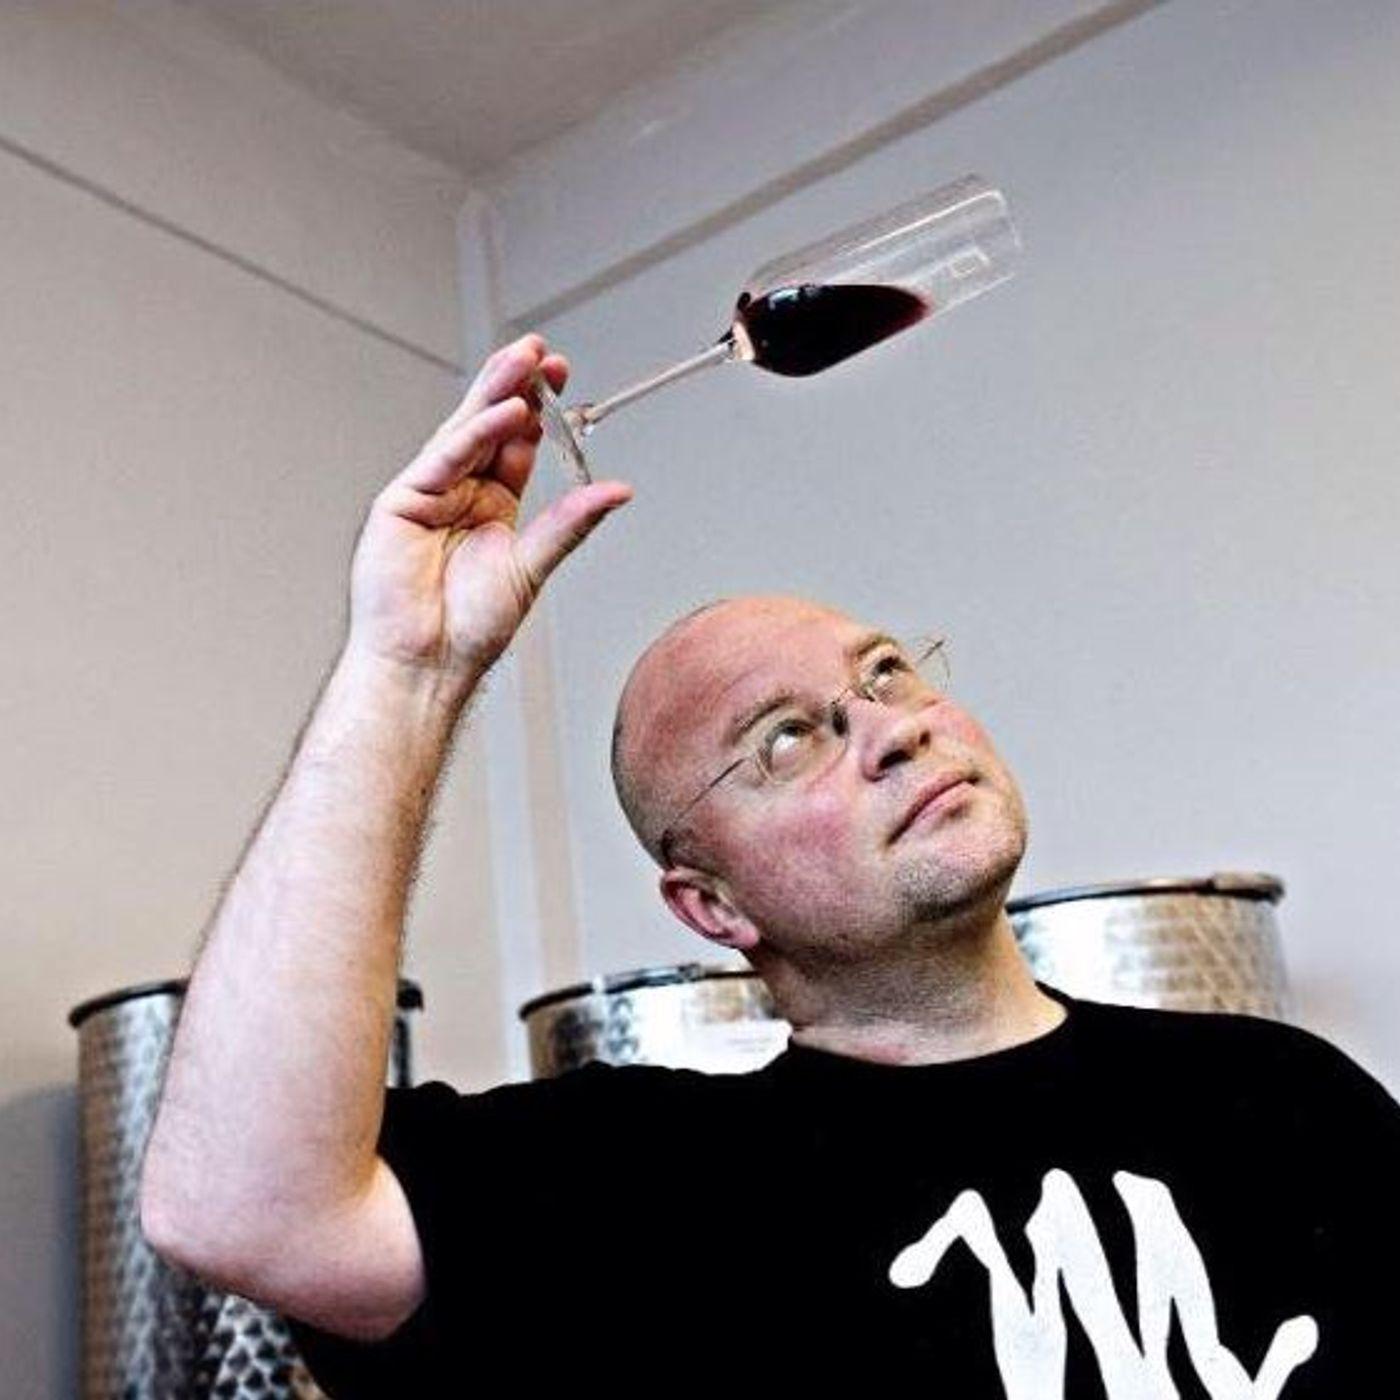 4-27-21 Stian Krog - Mjøderiet Mead - Bringing back mead in Norway